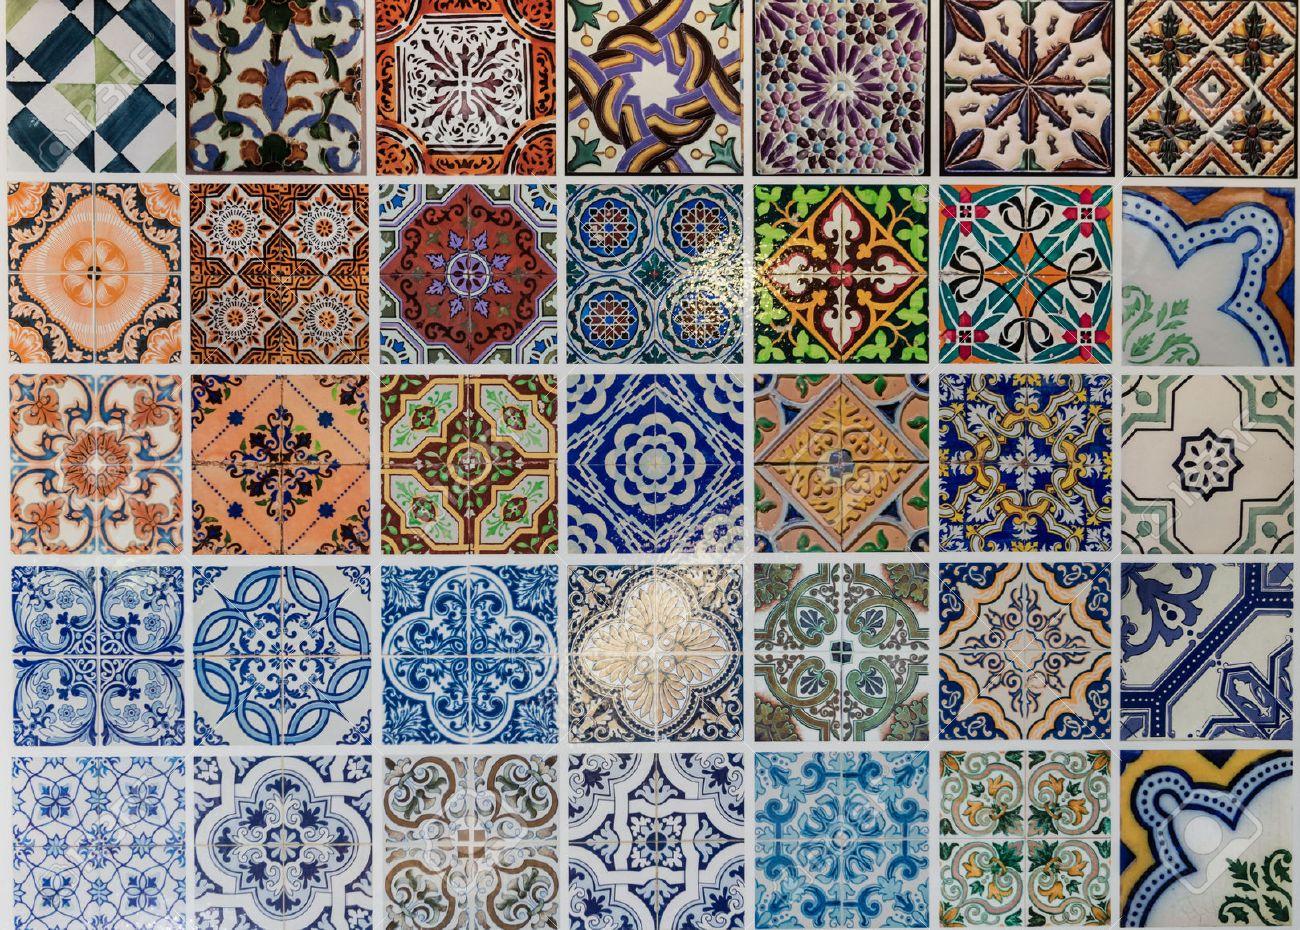 Tiles ceramic patterns from Lisbon, Portugal. - 51933113